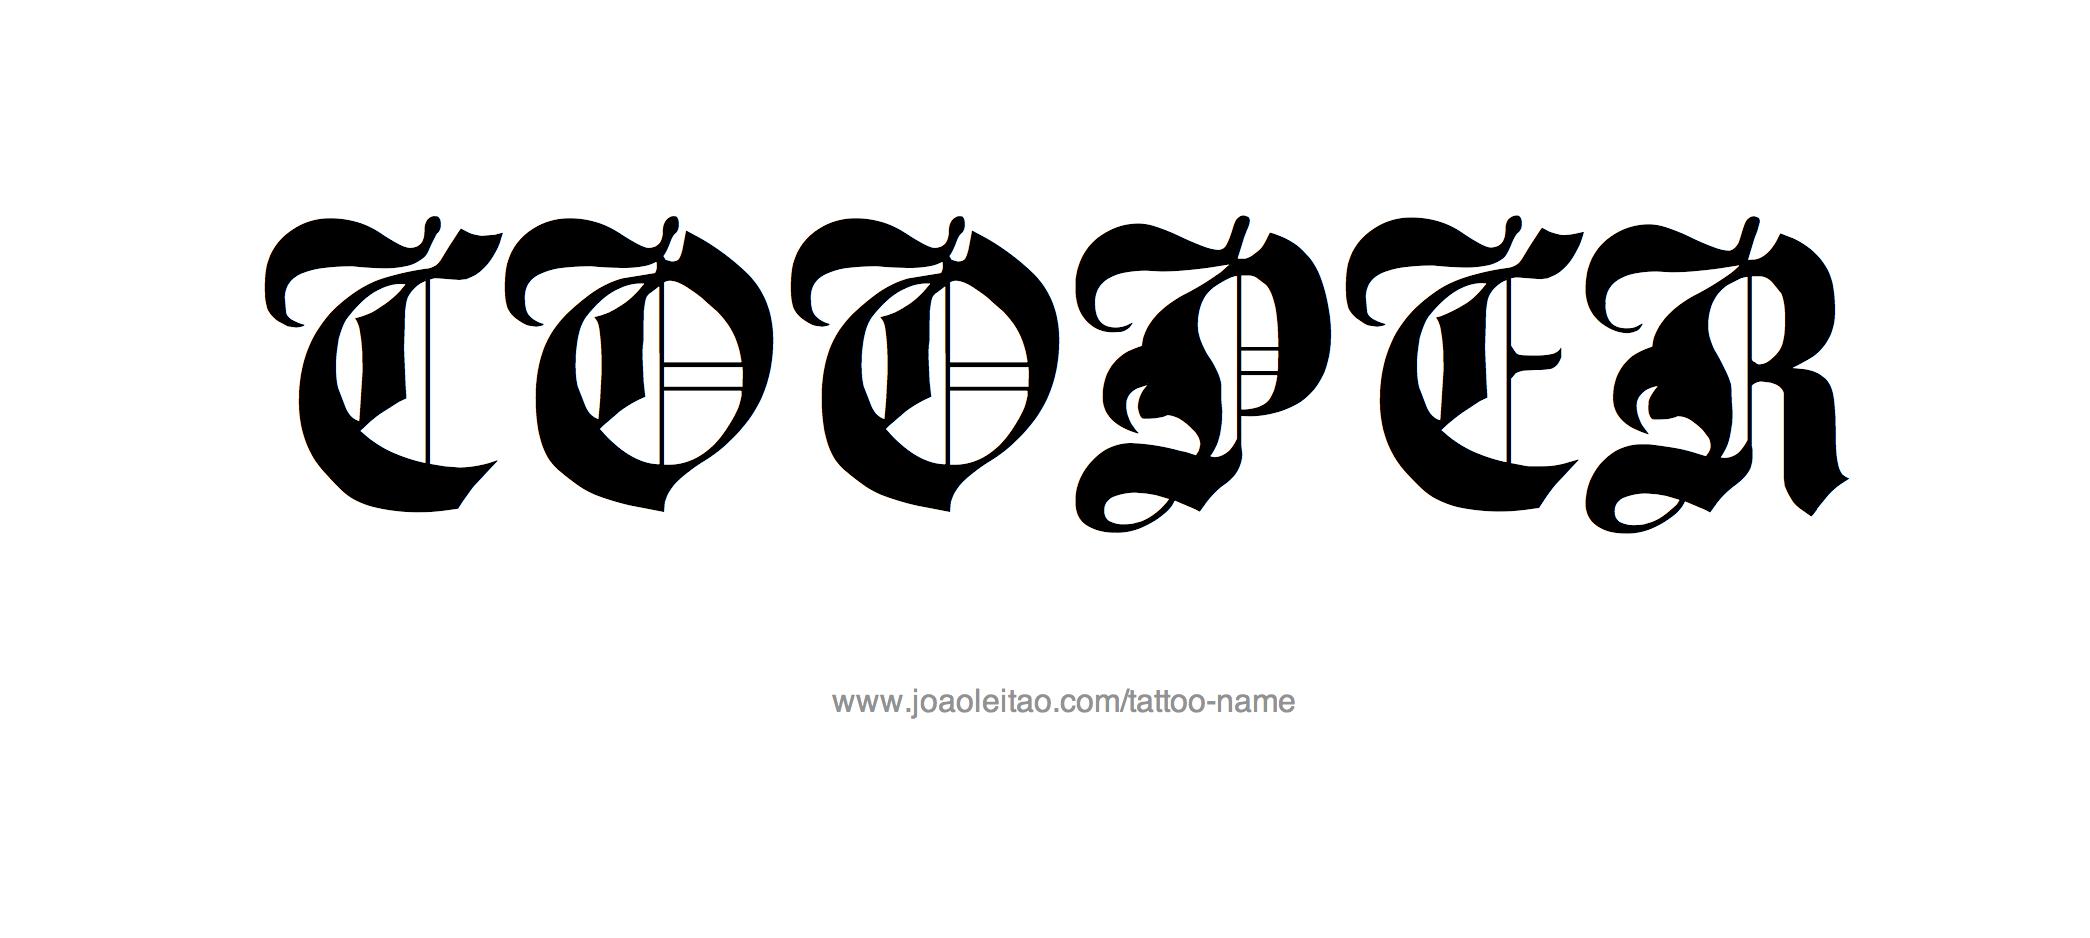 Cooper Name Tattoo Designs